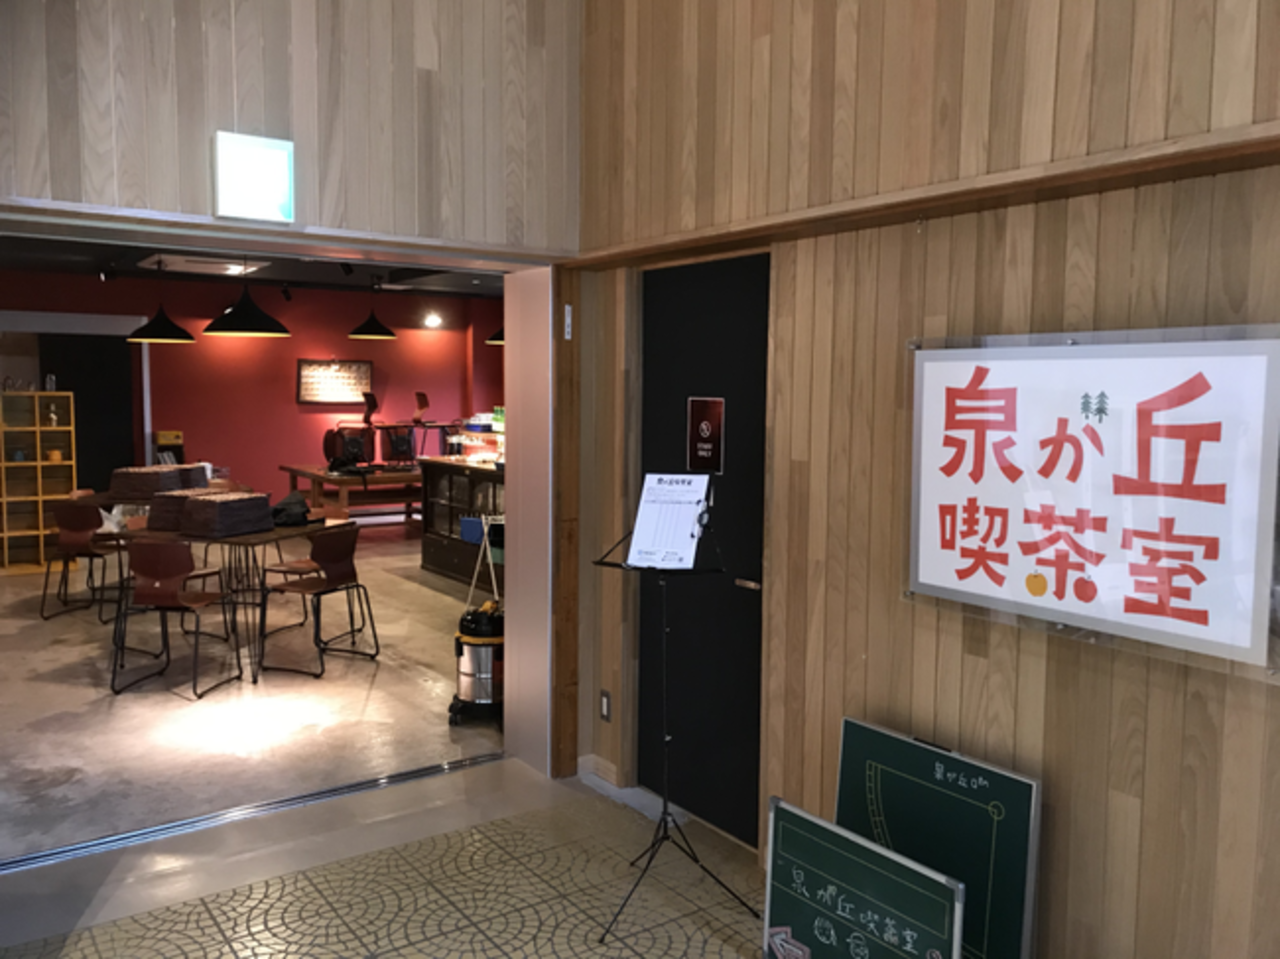 祝!7/17.GrandOpen『泉が丘喫茶室』(長野県上水内郡)